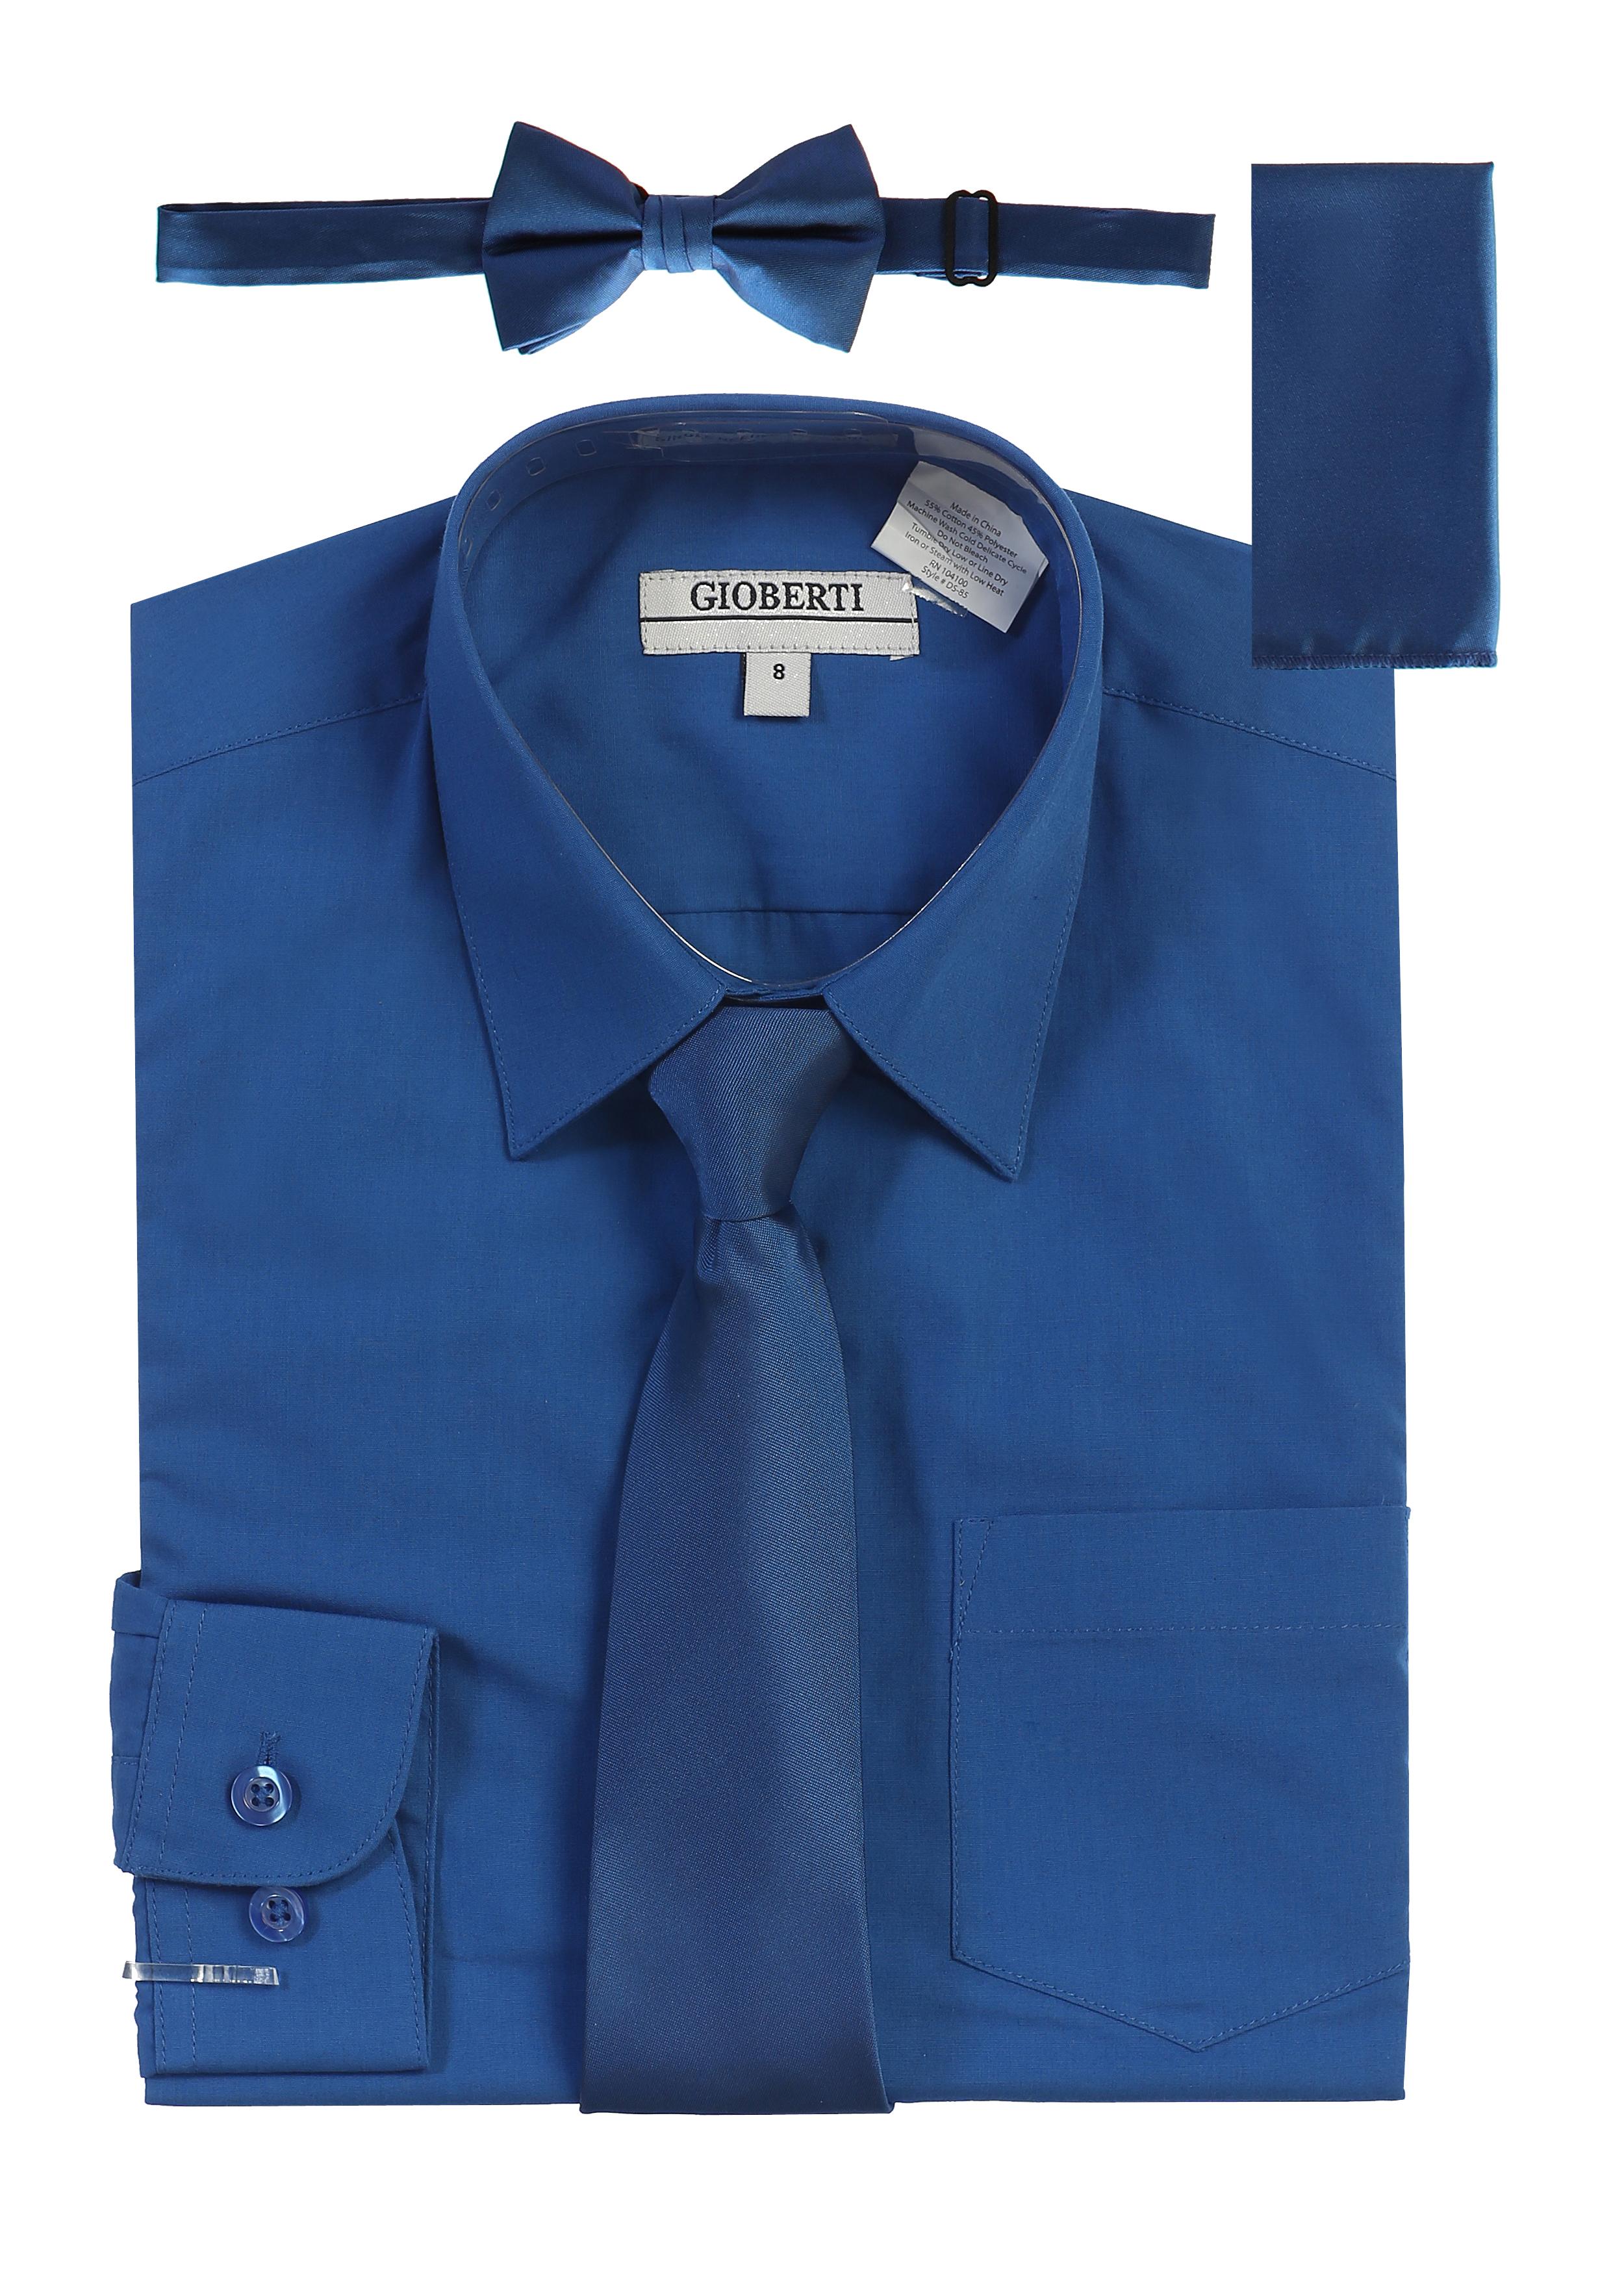 Gioberti Boy's Long Sleeve Dress Shirt + Solid Zippered Tie Set